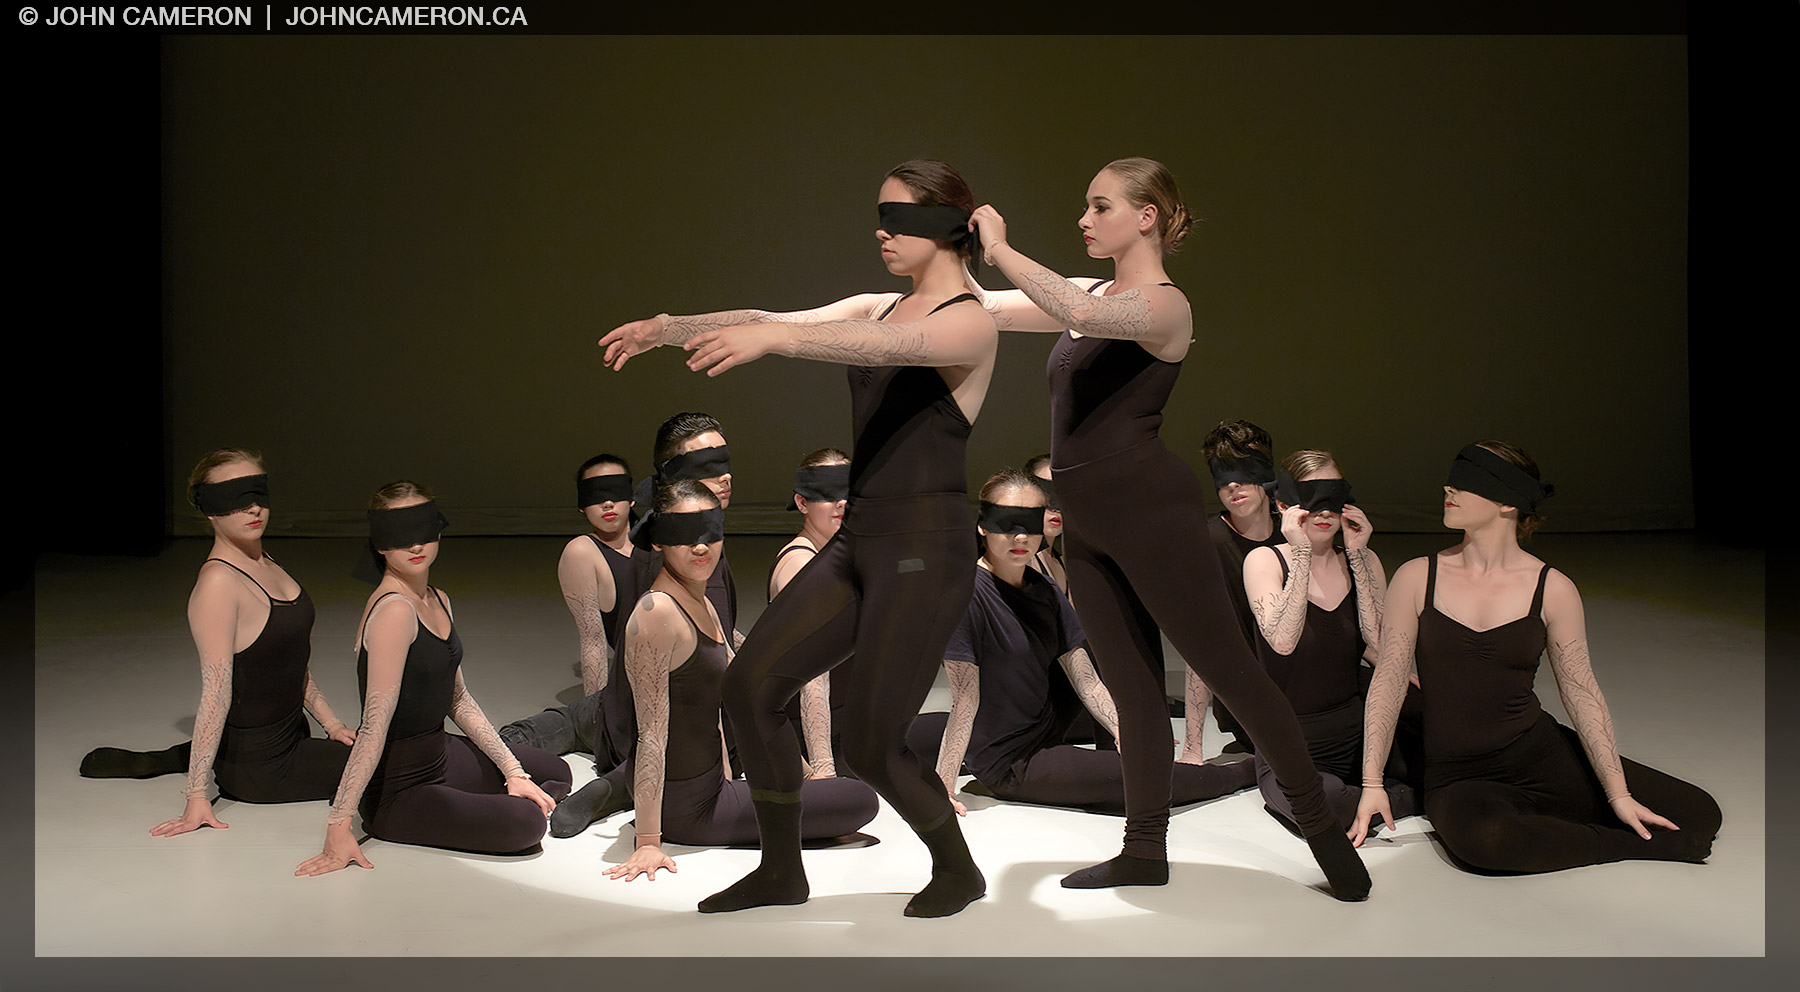 Dance at ArtSpring